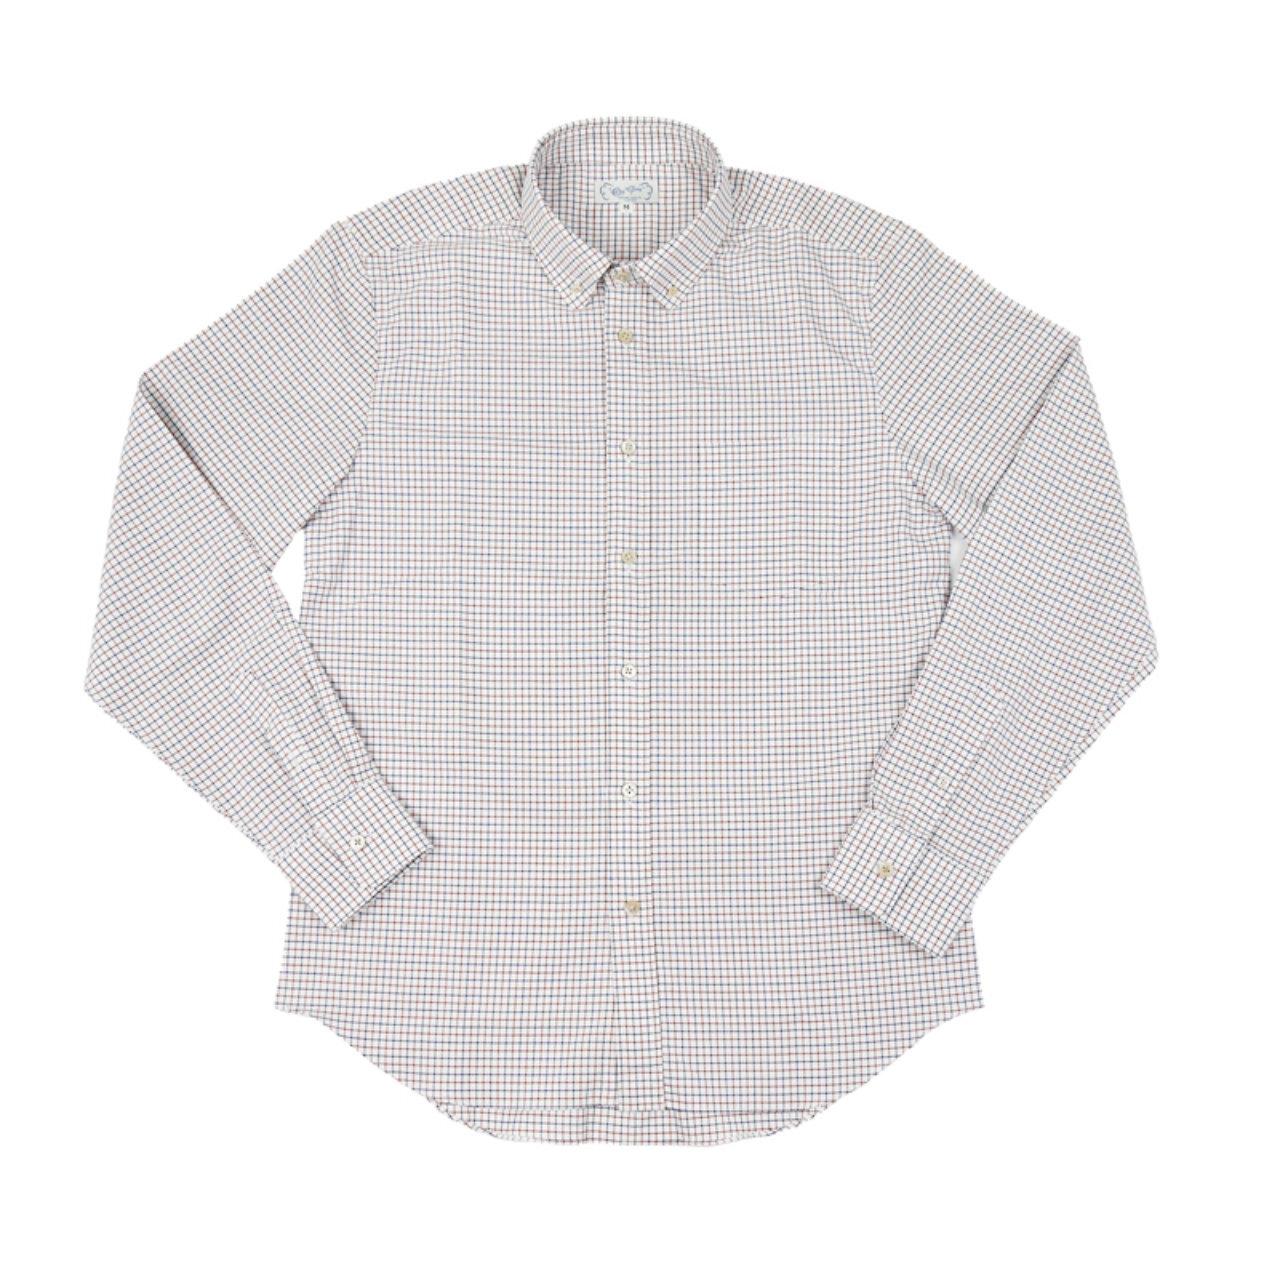 【Or Glory】 タッターソールチェック 丸襟 BDシャツ